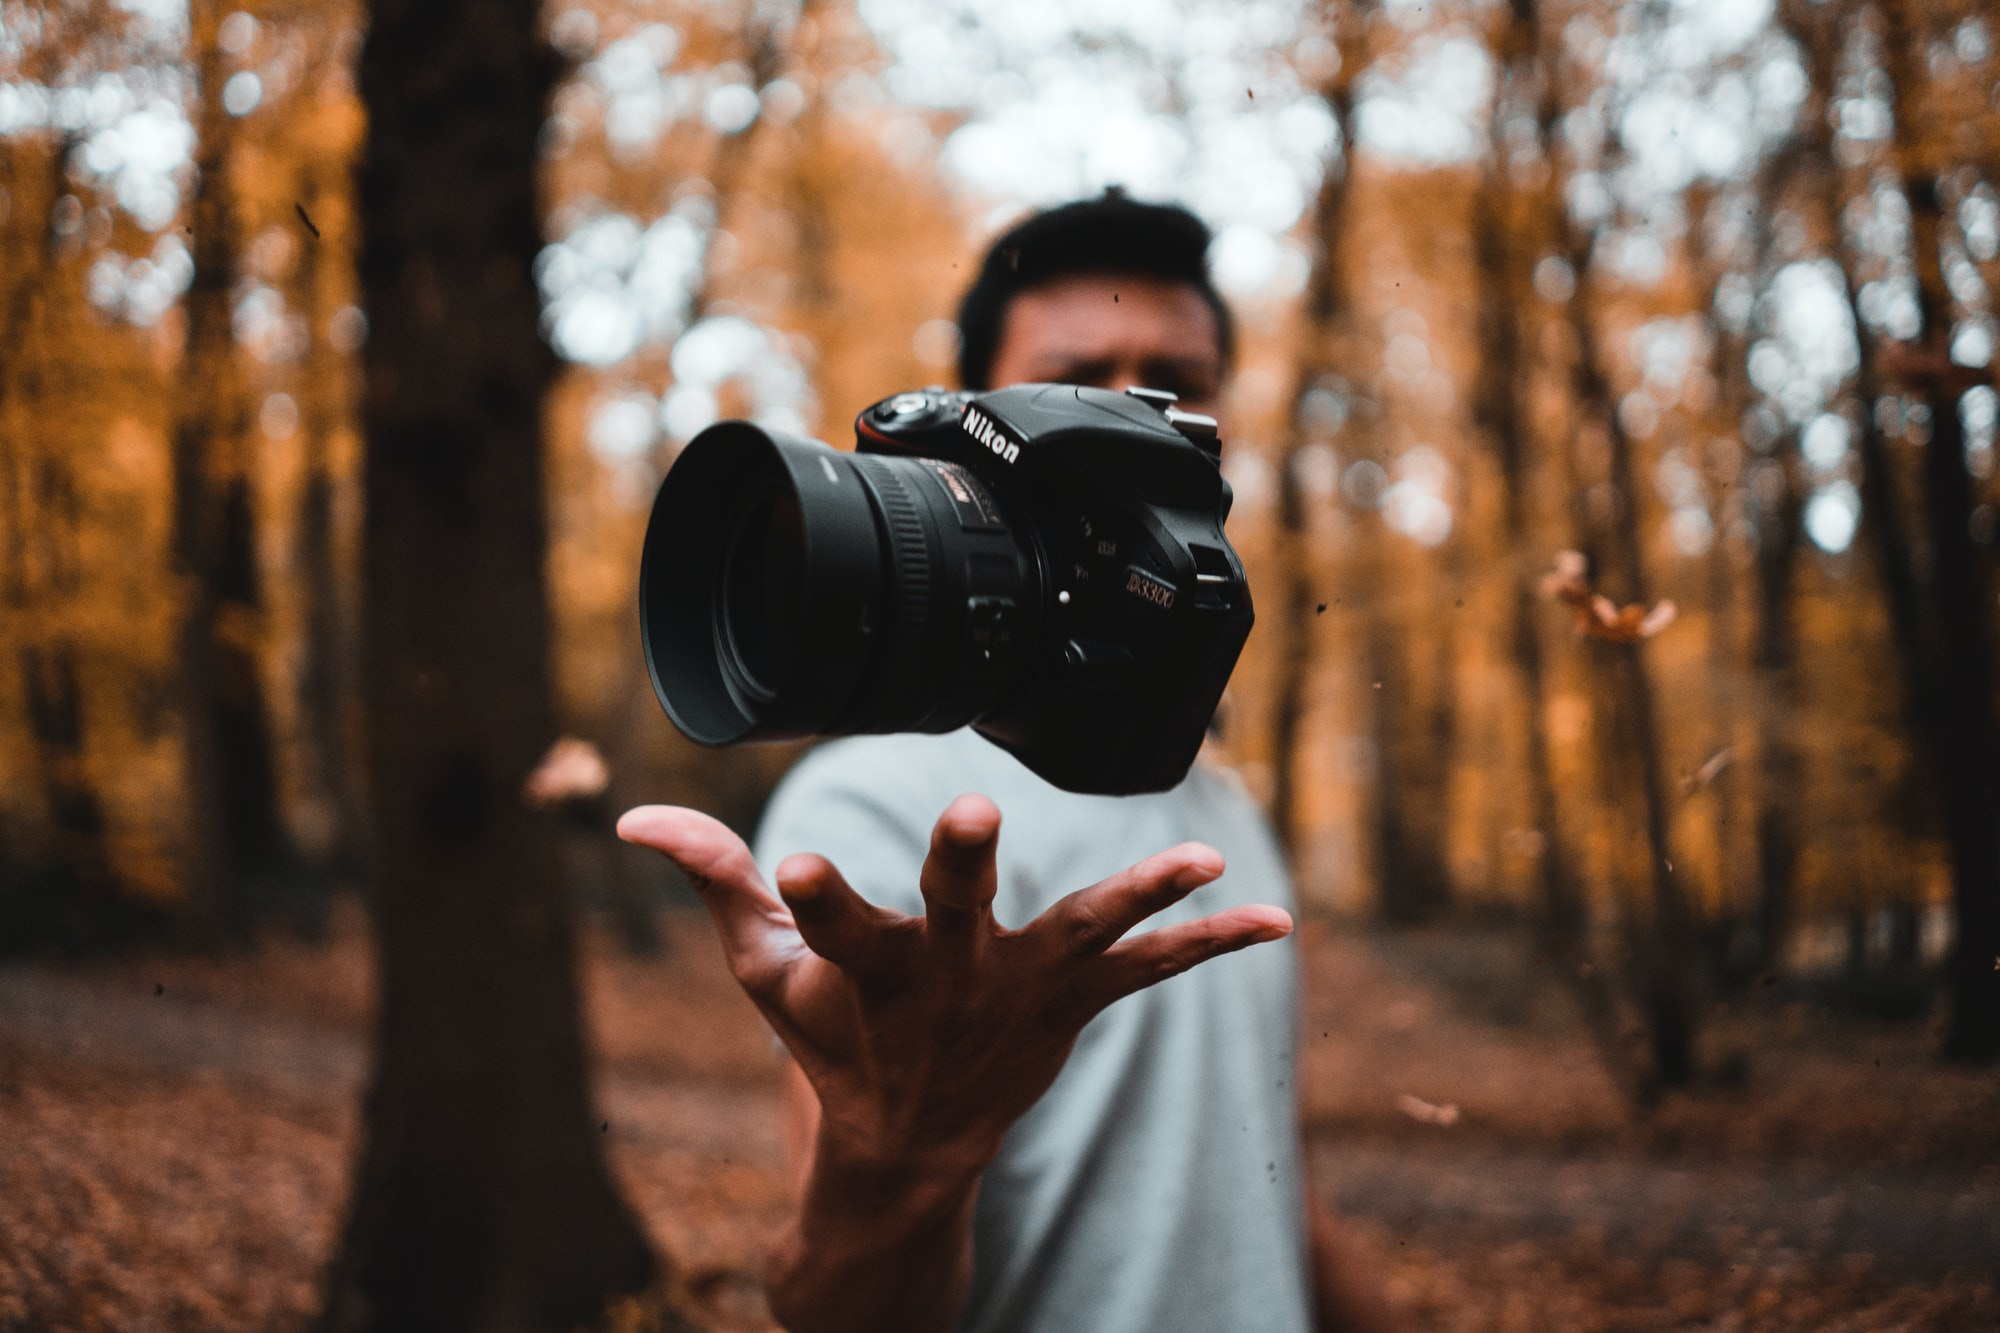 Creative Expression through Photography